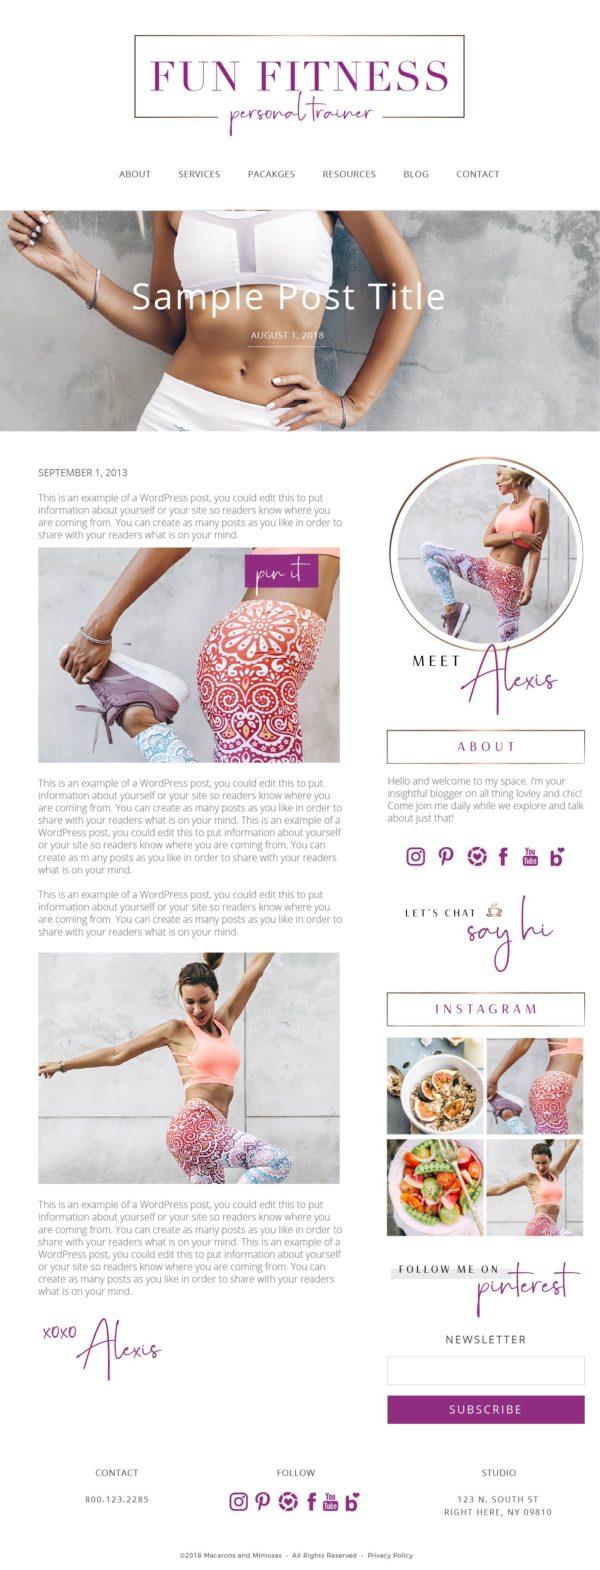 Fitness Wordpress Theme, Personal Trainer Logo Website Theme, Studio Press Theme